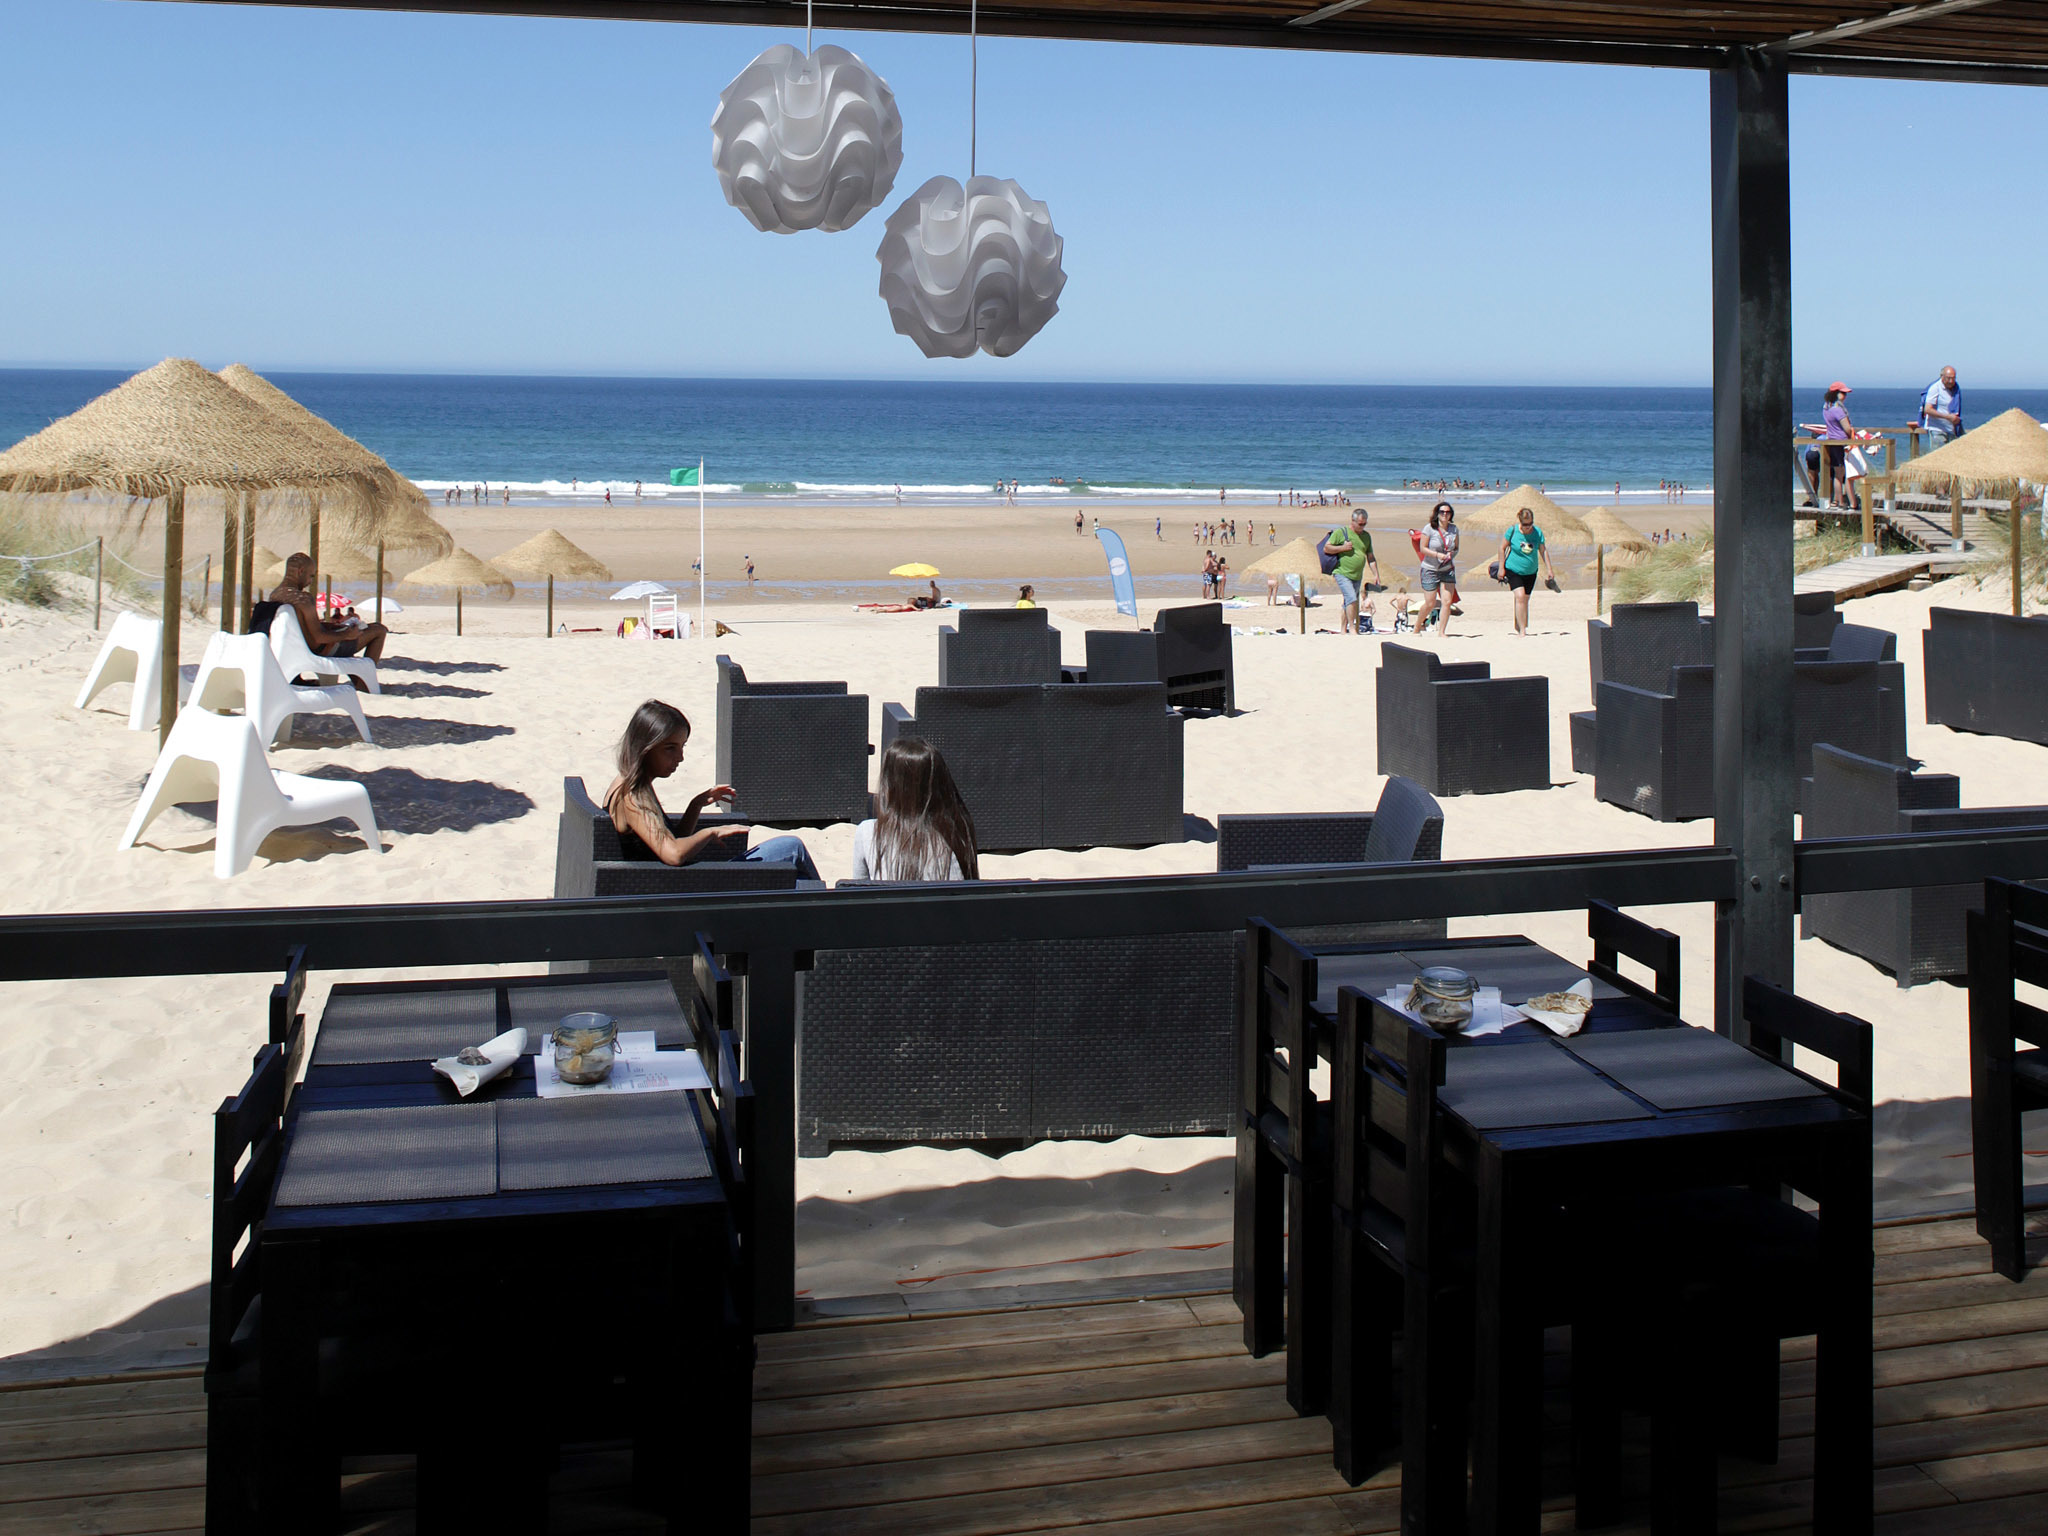 Ocean's Beach Club - Praia do Castelo, Costa da Caparica